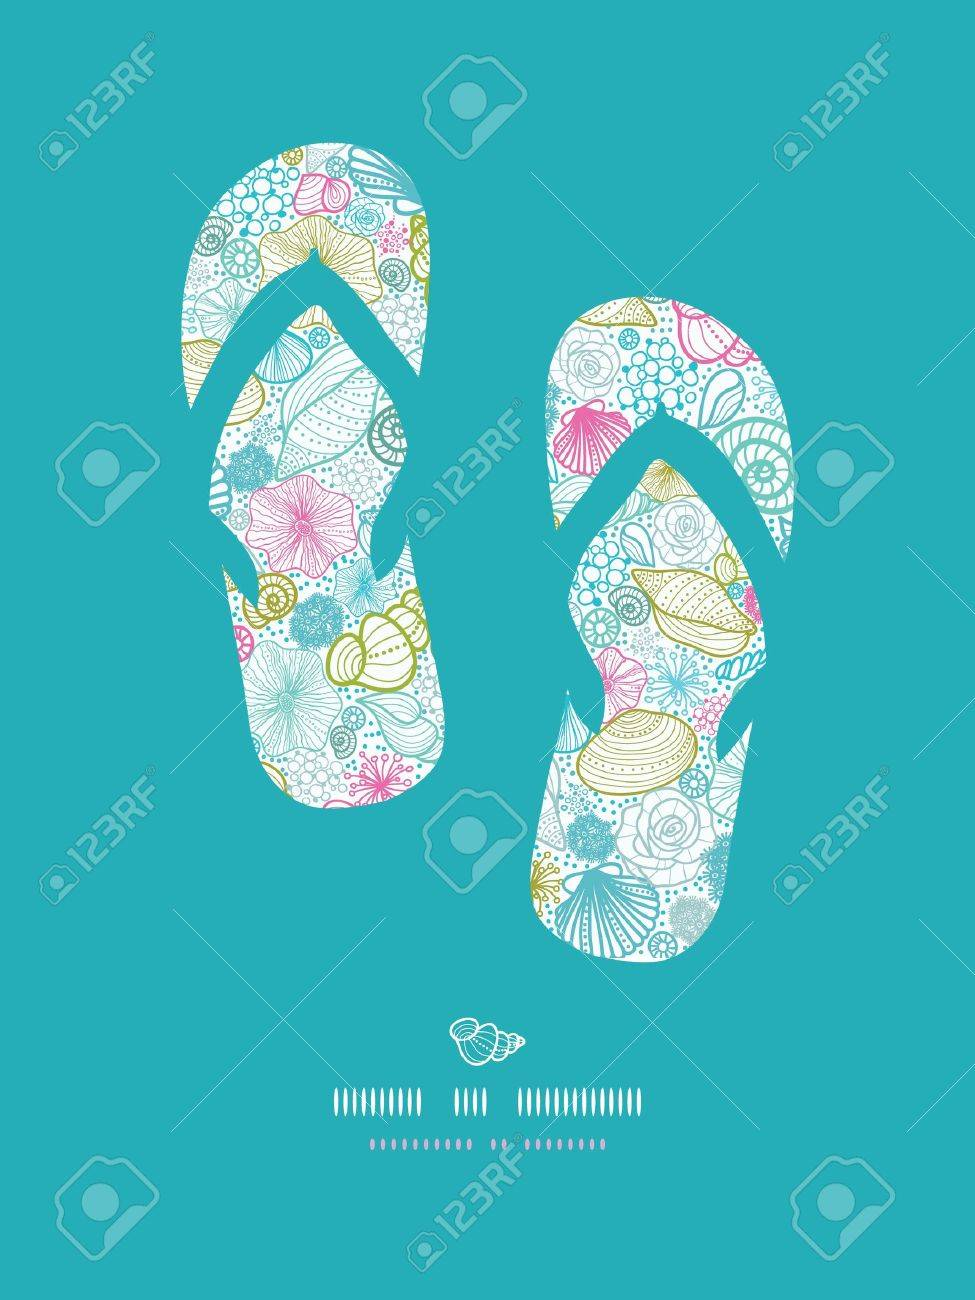 Seashells line art flip flops decor pattern background Stock Vector - 18433397